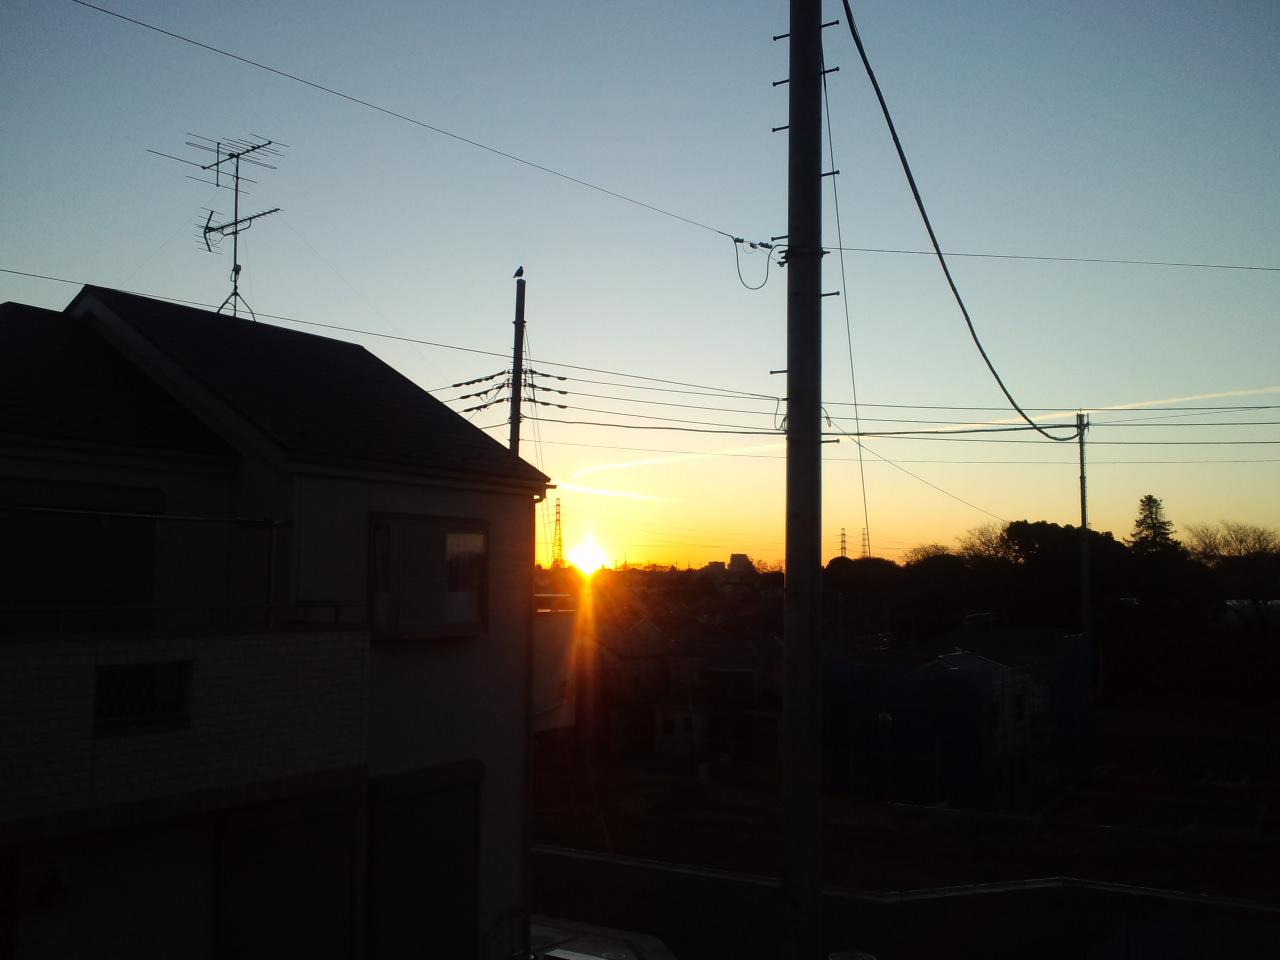 c0130324_818024.jpg